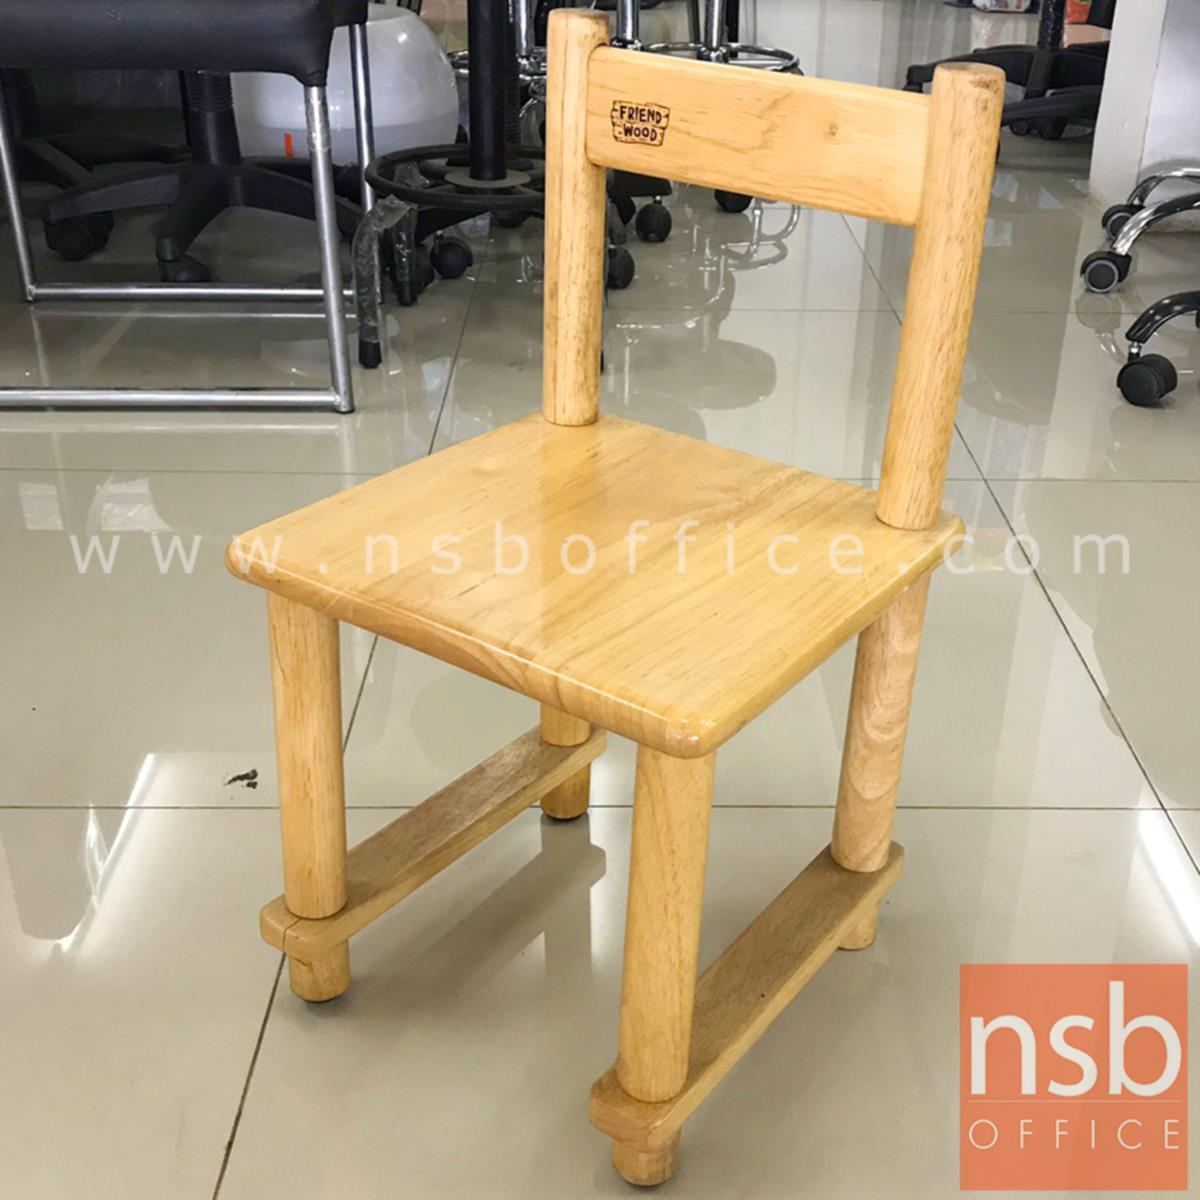 L02A286:เก้าอี้เด็กไม้ล้วน รุ่น NSB-KID5 ขนาด 29W*52H cm. (STOCK-1 ตัว)